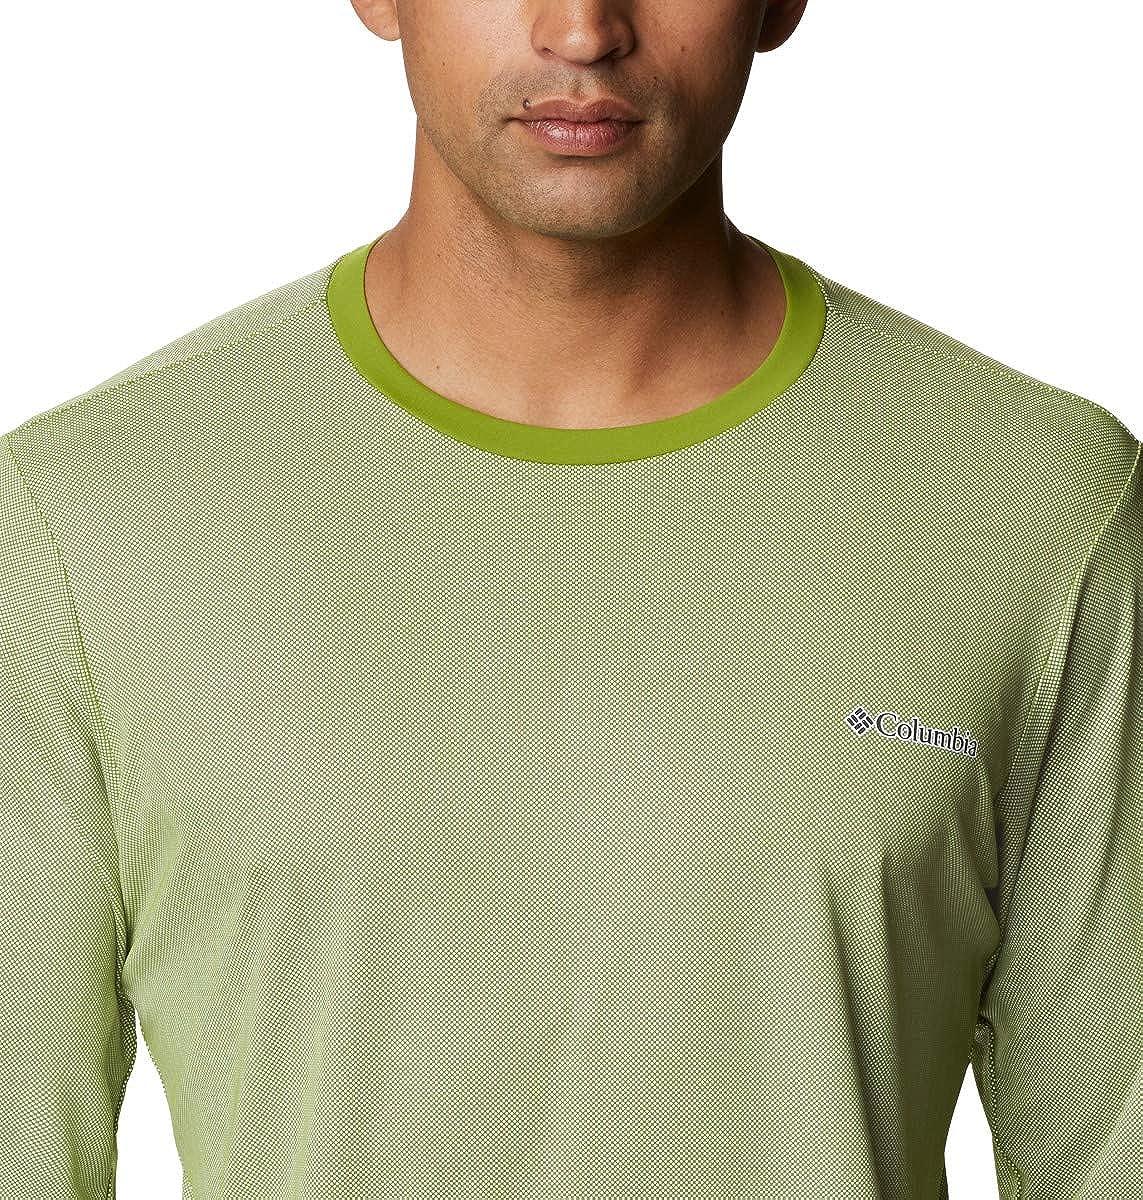 Columbia Mens Sun Deflector Summerdry Long Sleeve Shirt Sp21